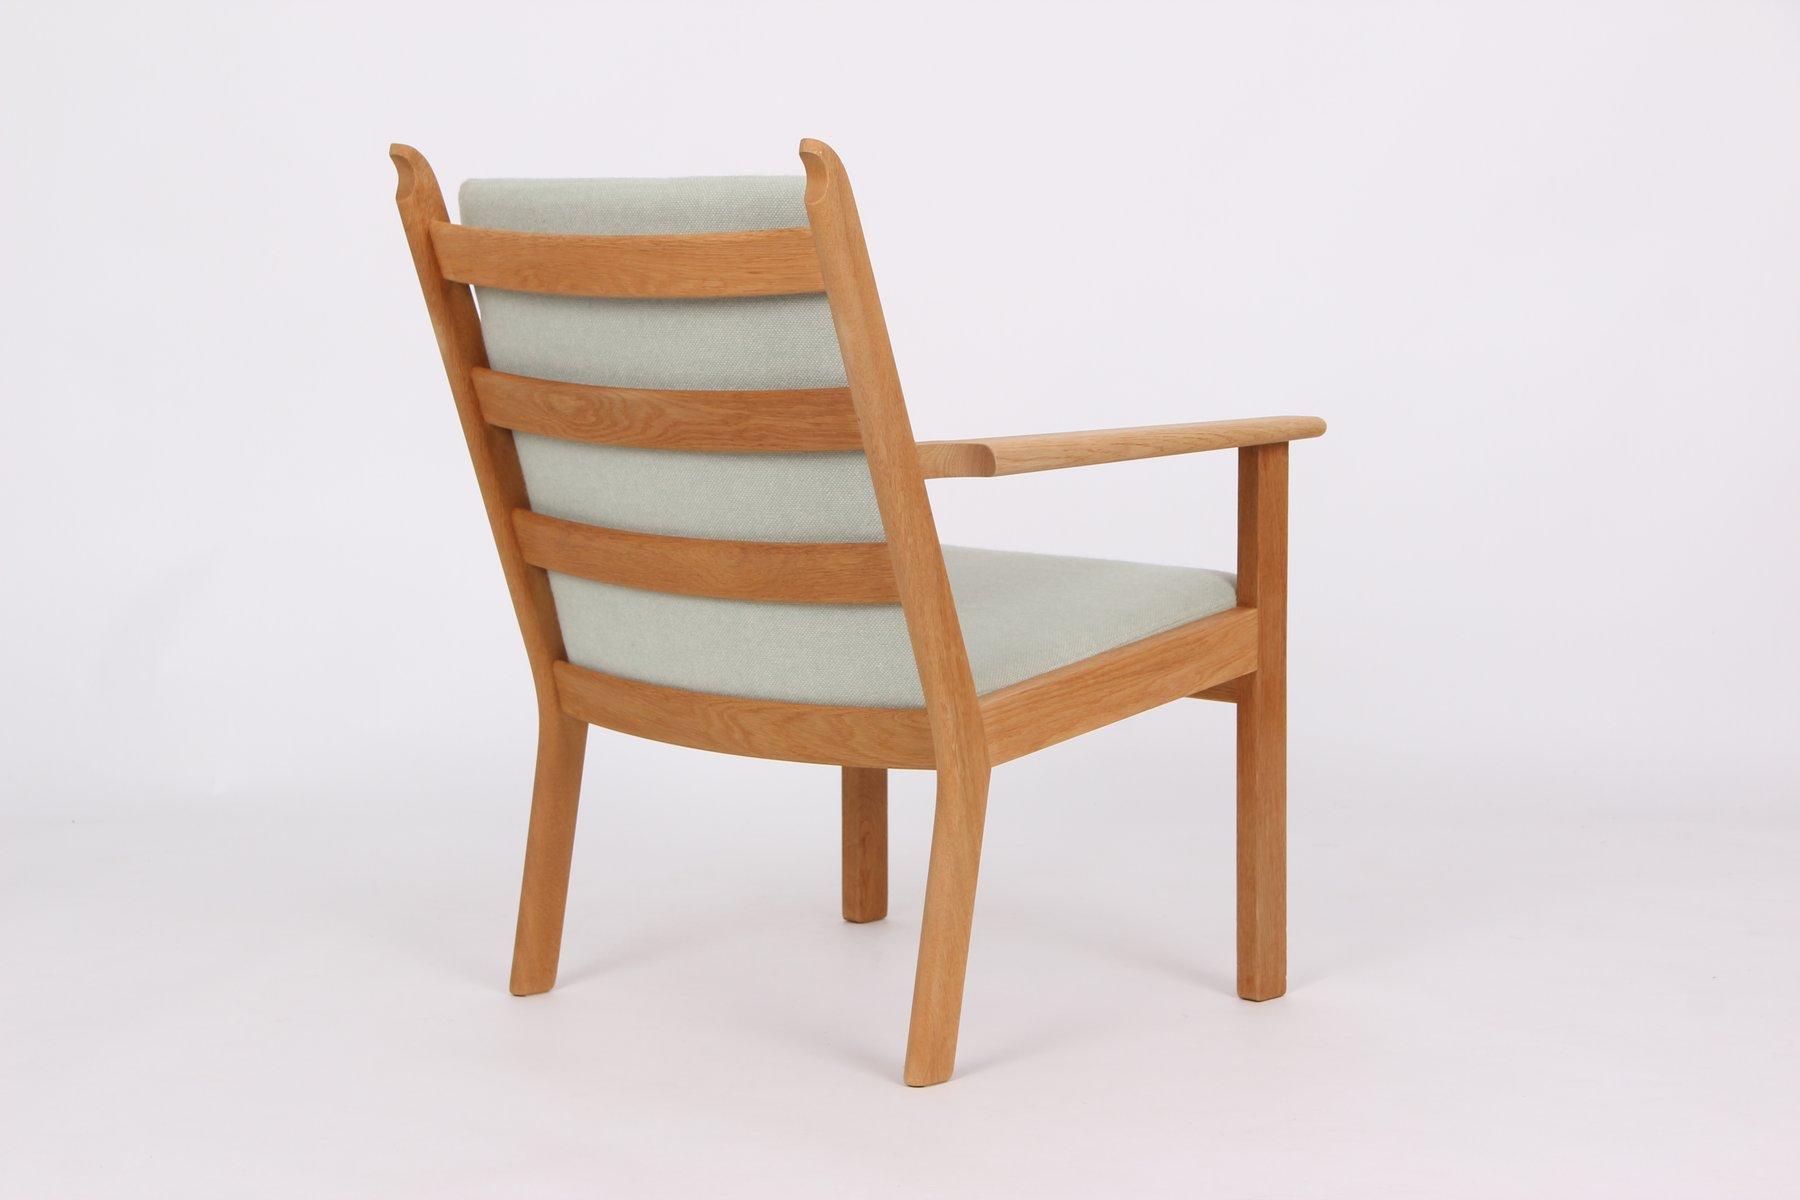 Vintage Danish Ge284 Easy Chair By Hans J Wegner For Getama For